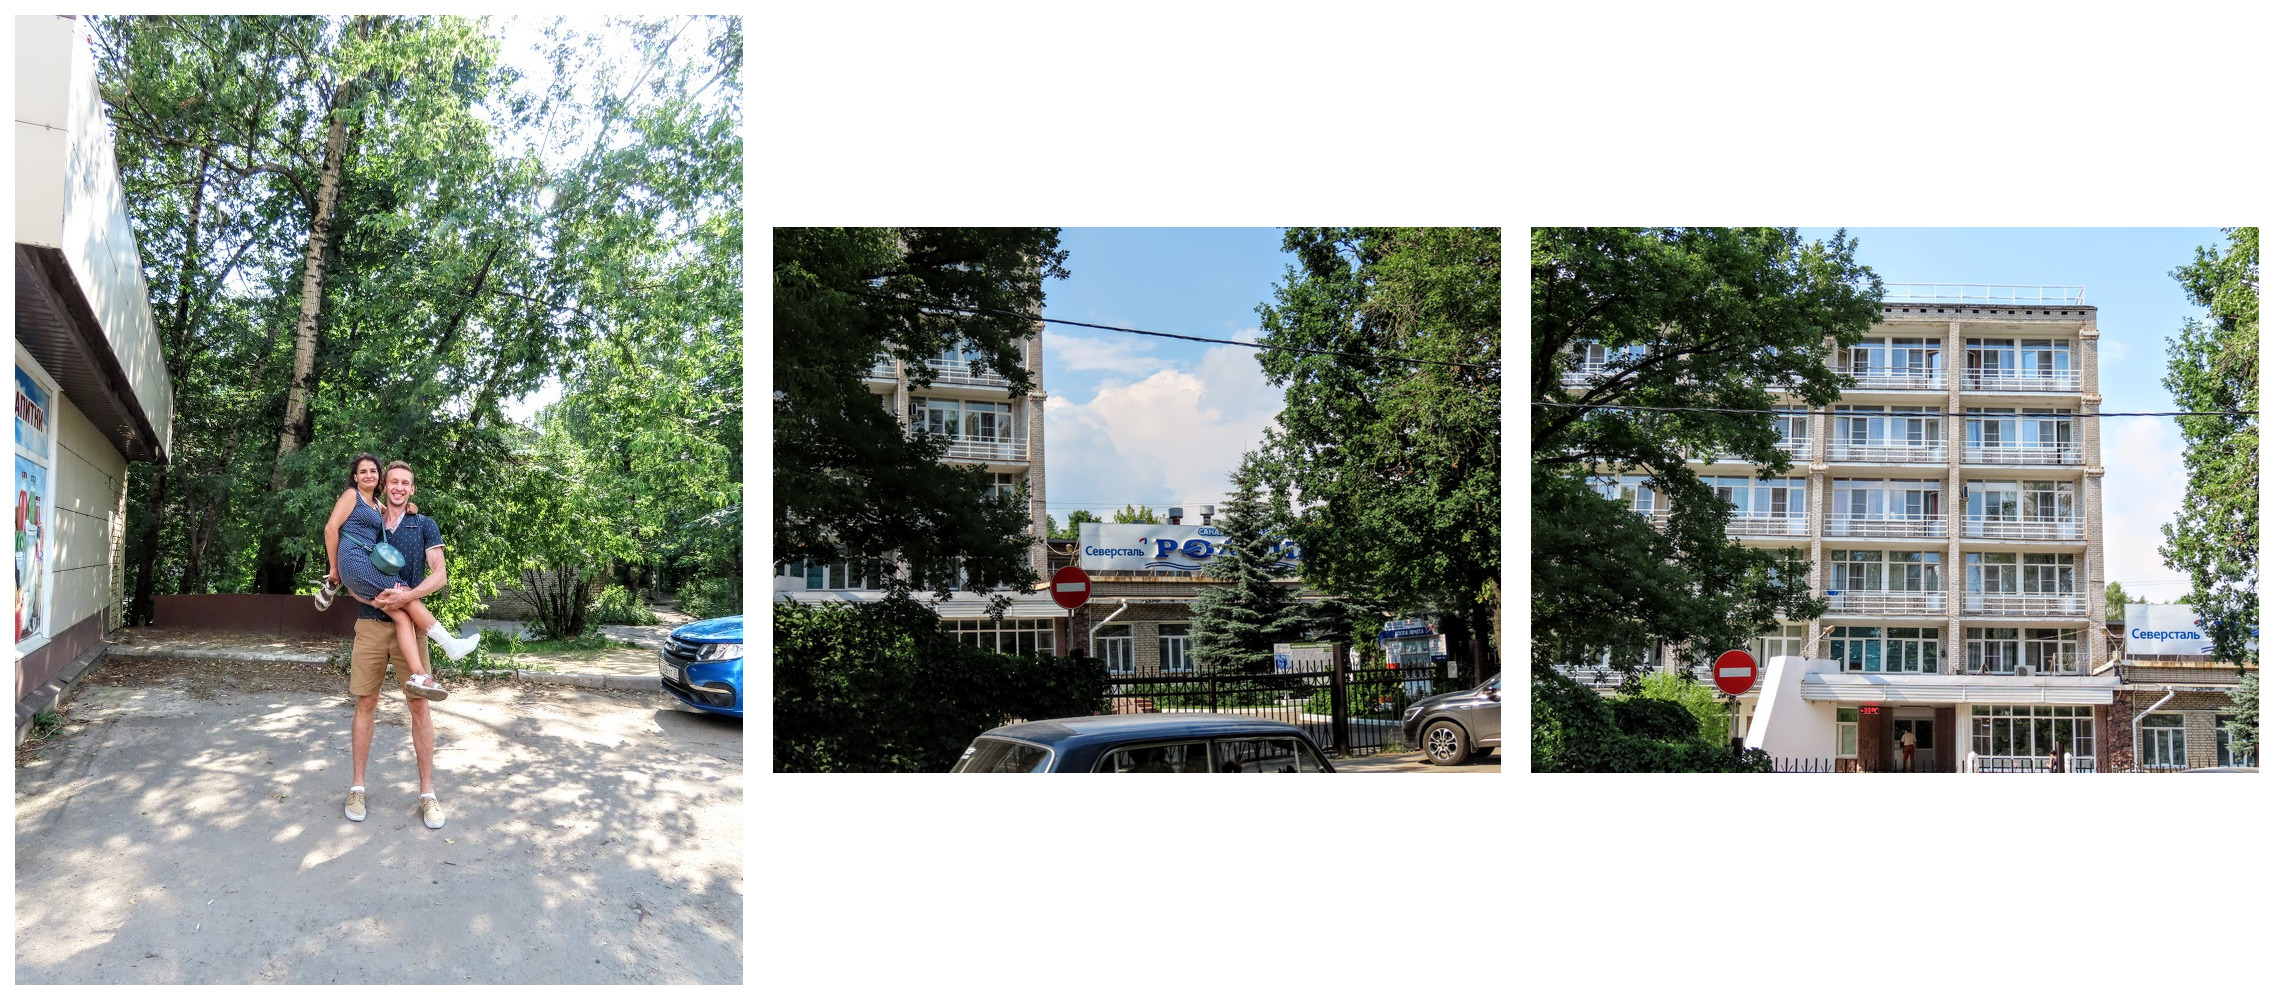 imgonline-com-ua-Collage-AIDbf-Hnj96k6yh-Dl